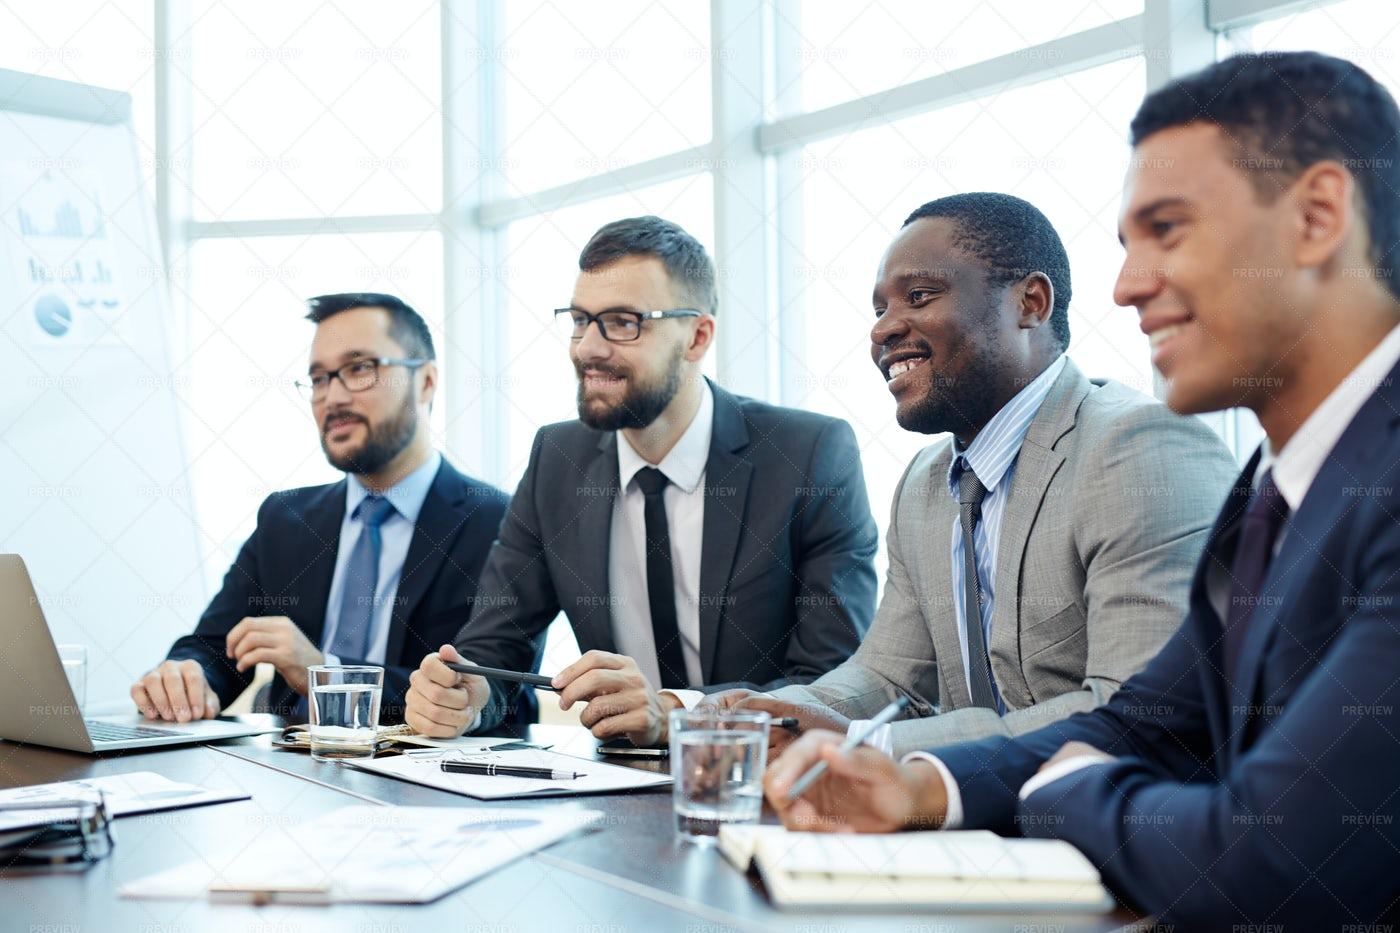 Presentation Of Team Leader In Boardroom: Stock Photos